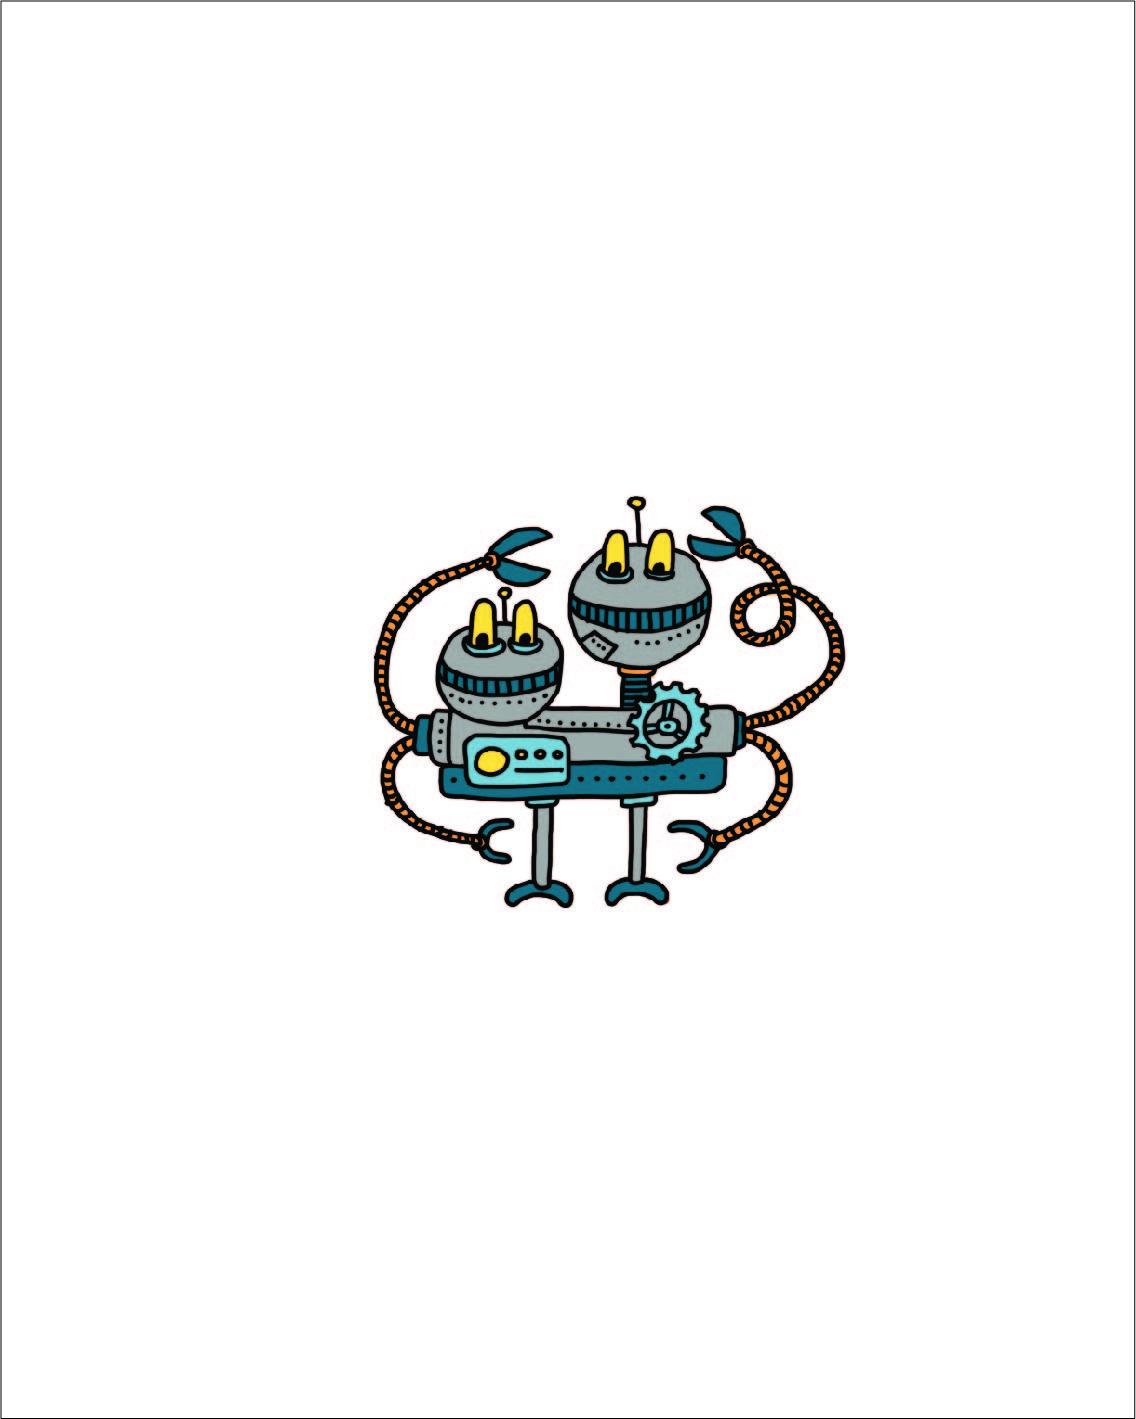 látka-teplákovina-panel-l-40x55-robot-bek